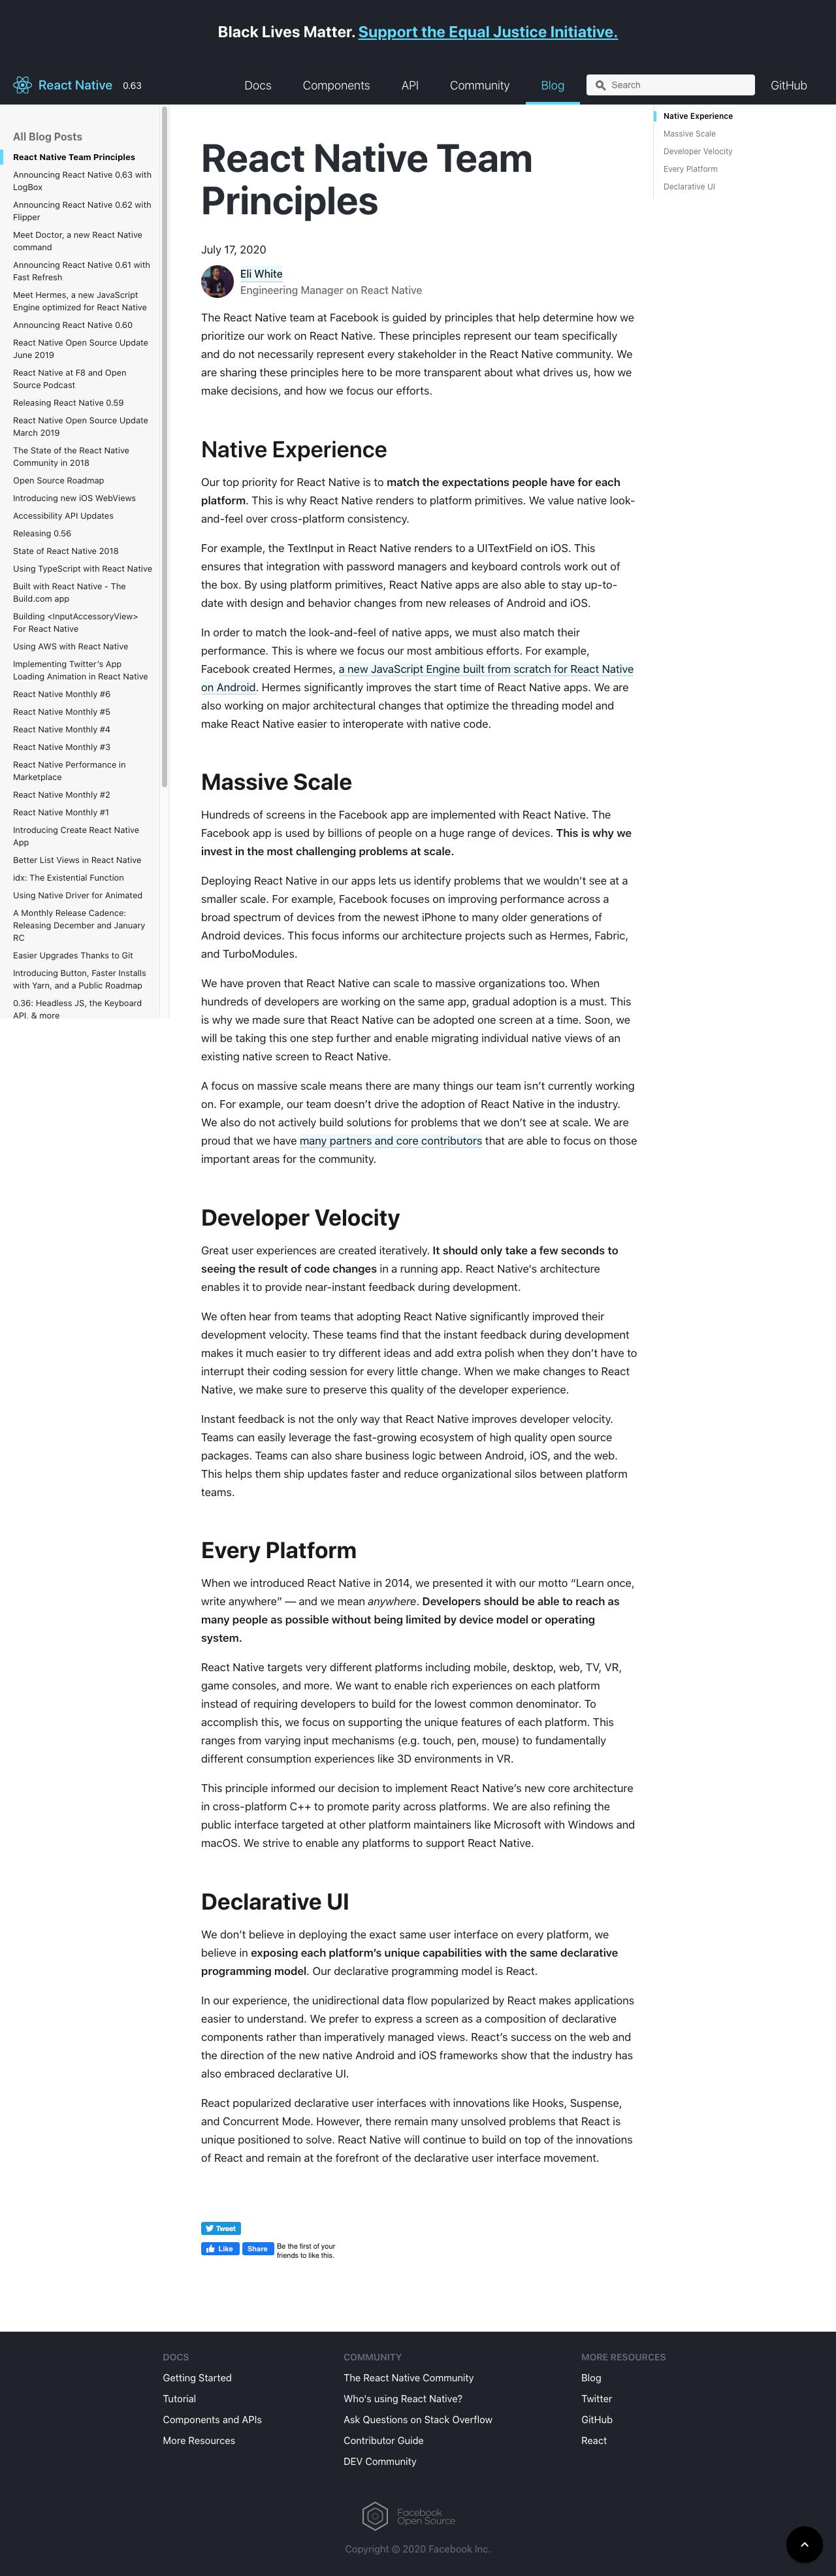 screencapture-localhost-3000-blog-2020-07-17-react-native-principles-2020-07-17-11_20_56